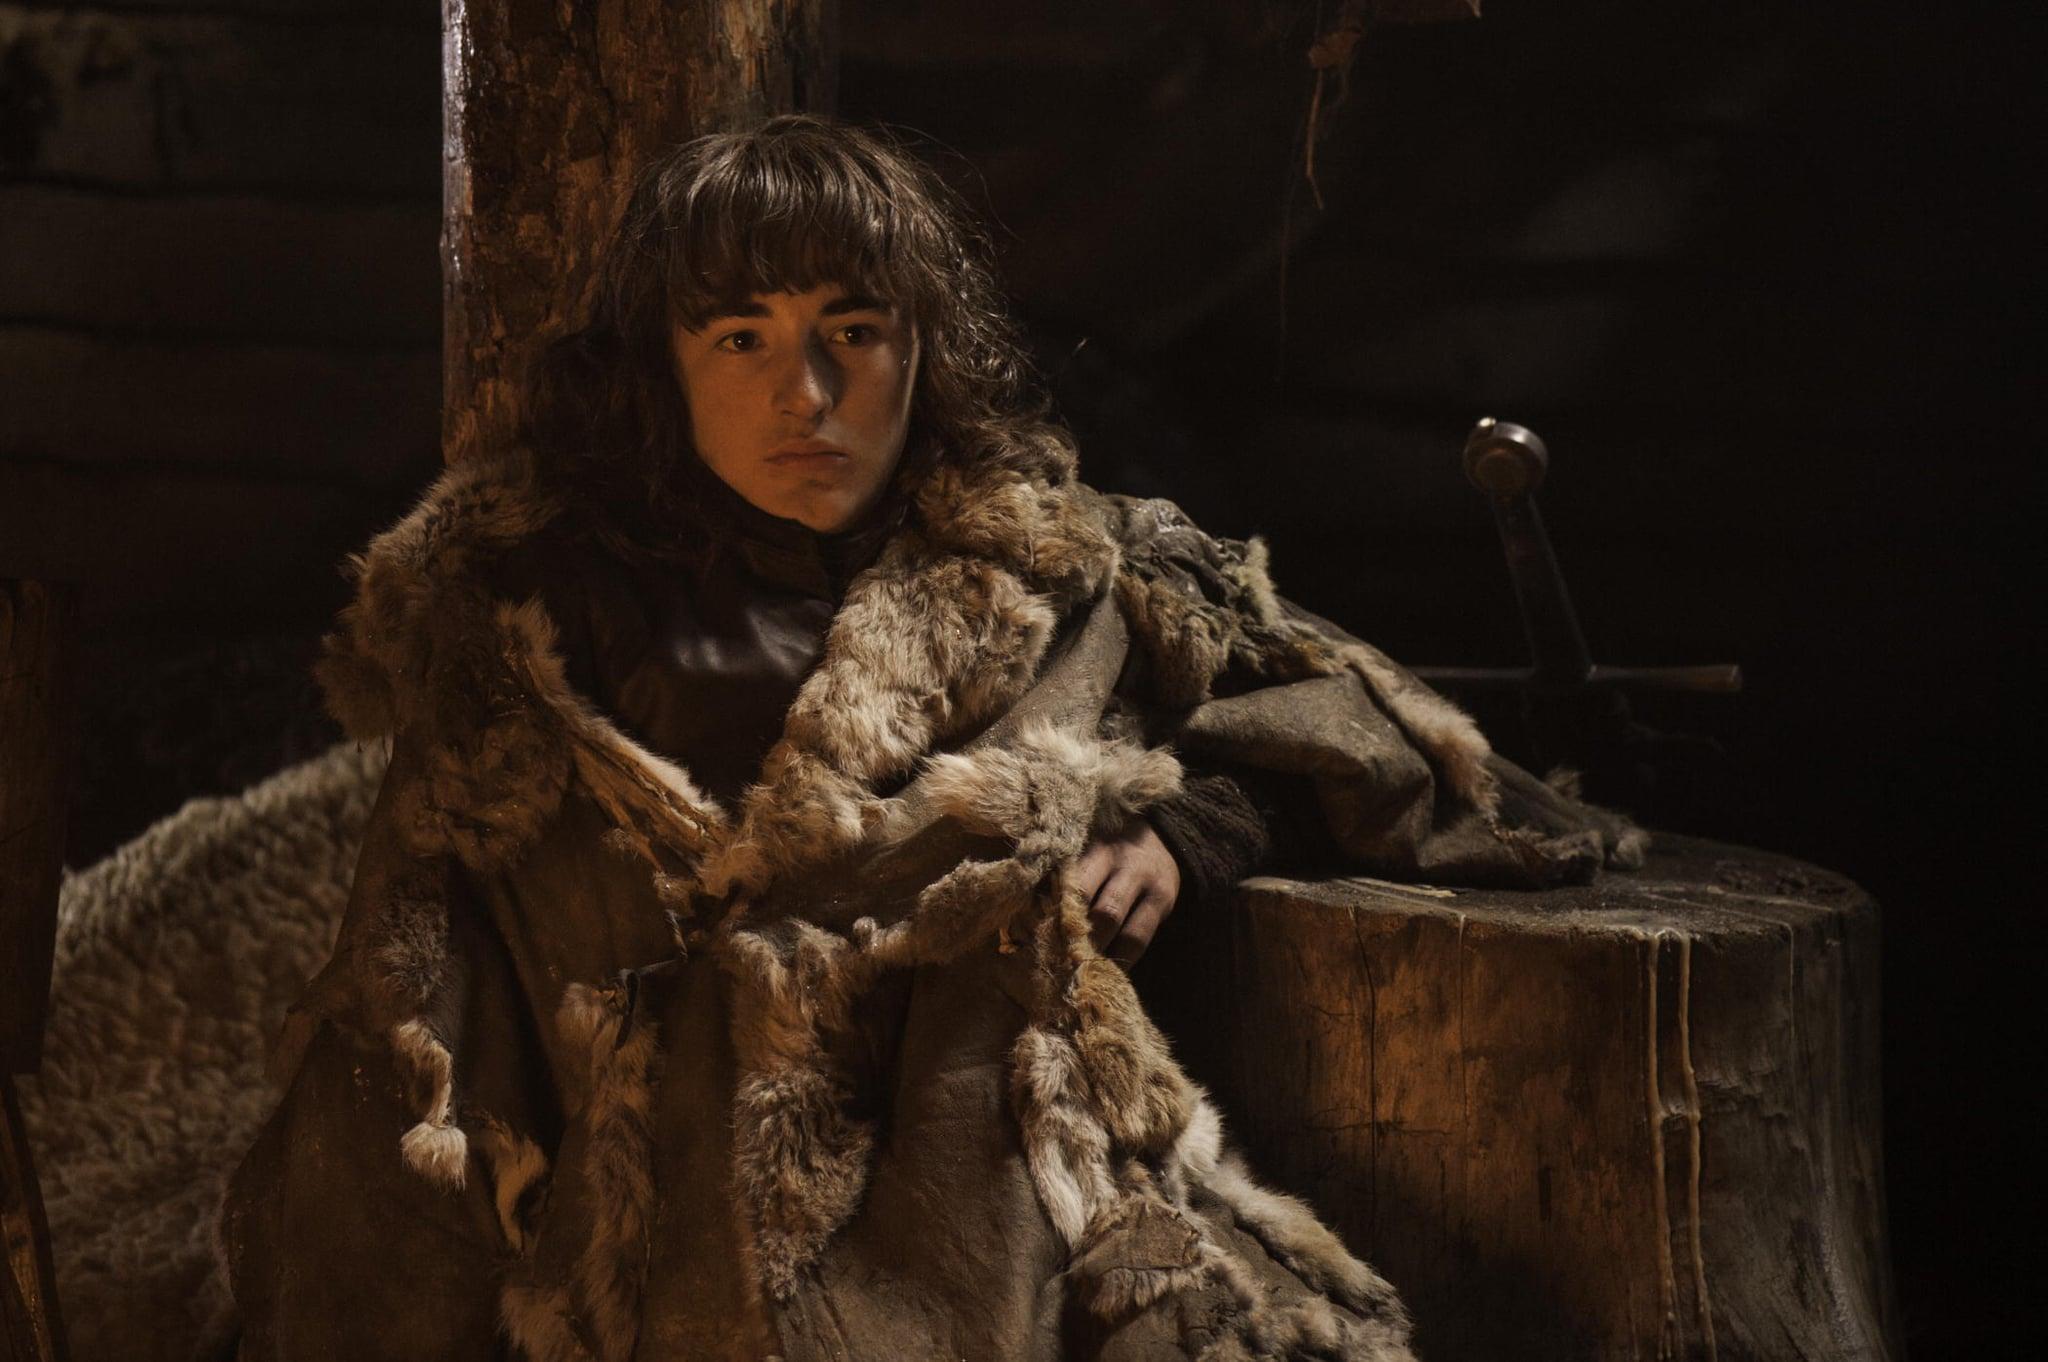 Bran Stark, Played by Isaac Hempstead-Wright